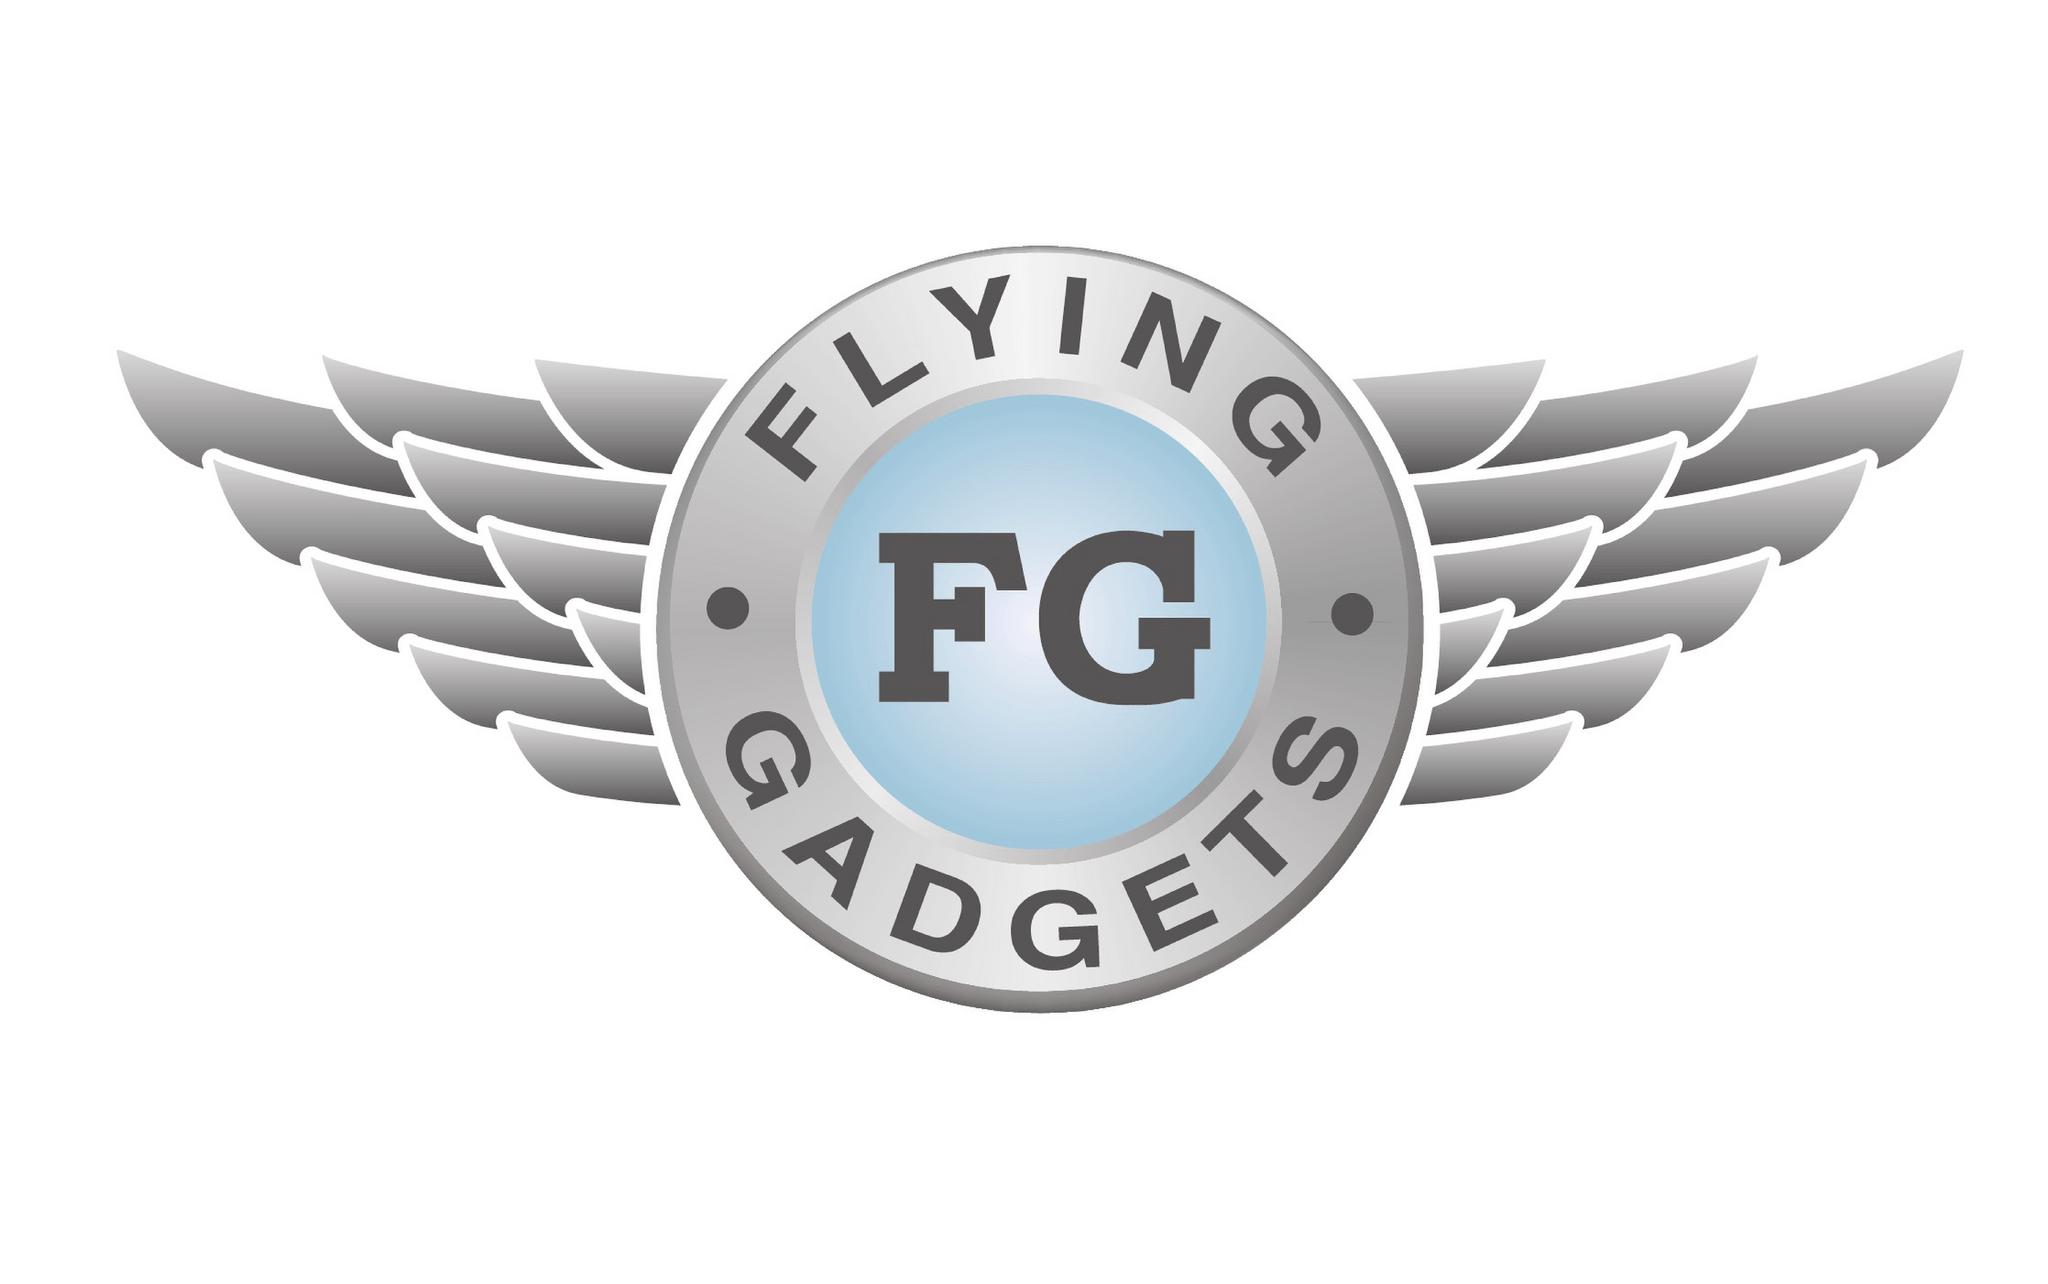 Flying Gadgets